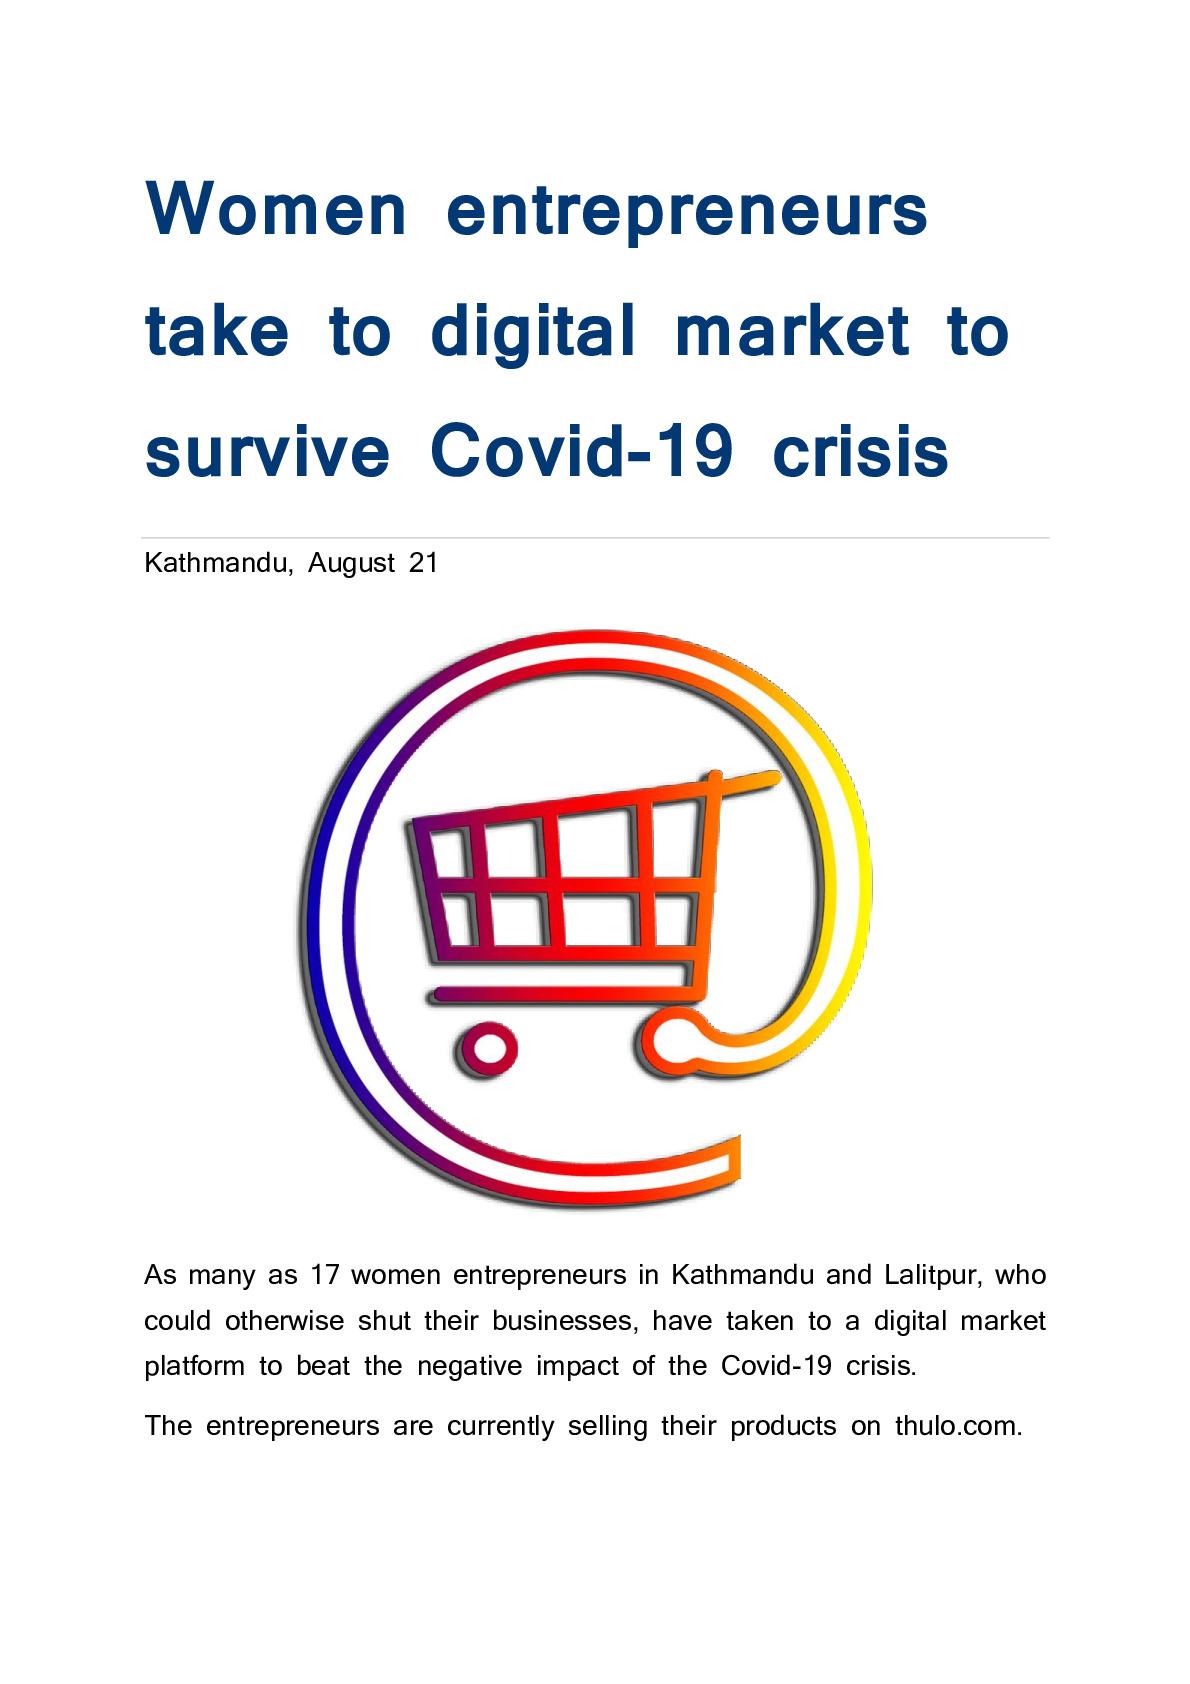 Women entrepreneurs take to digital market to survive Covid-19 crisis